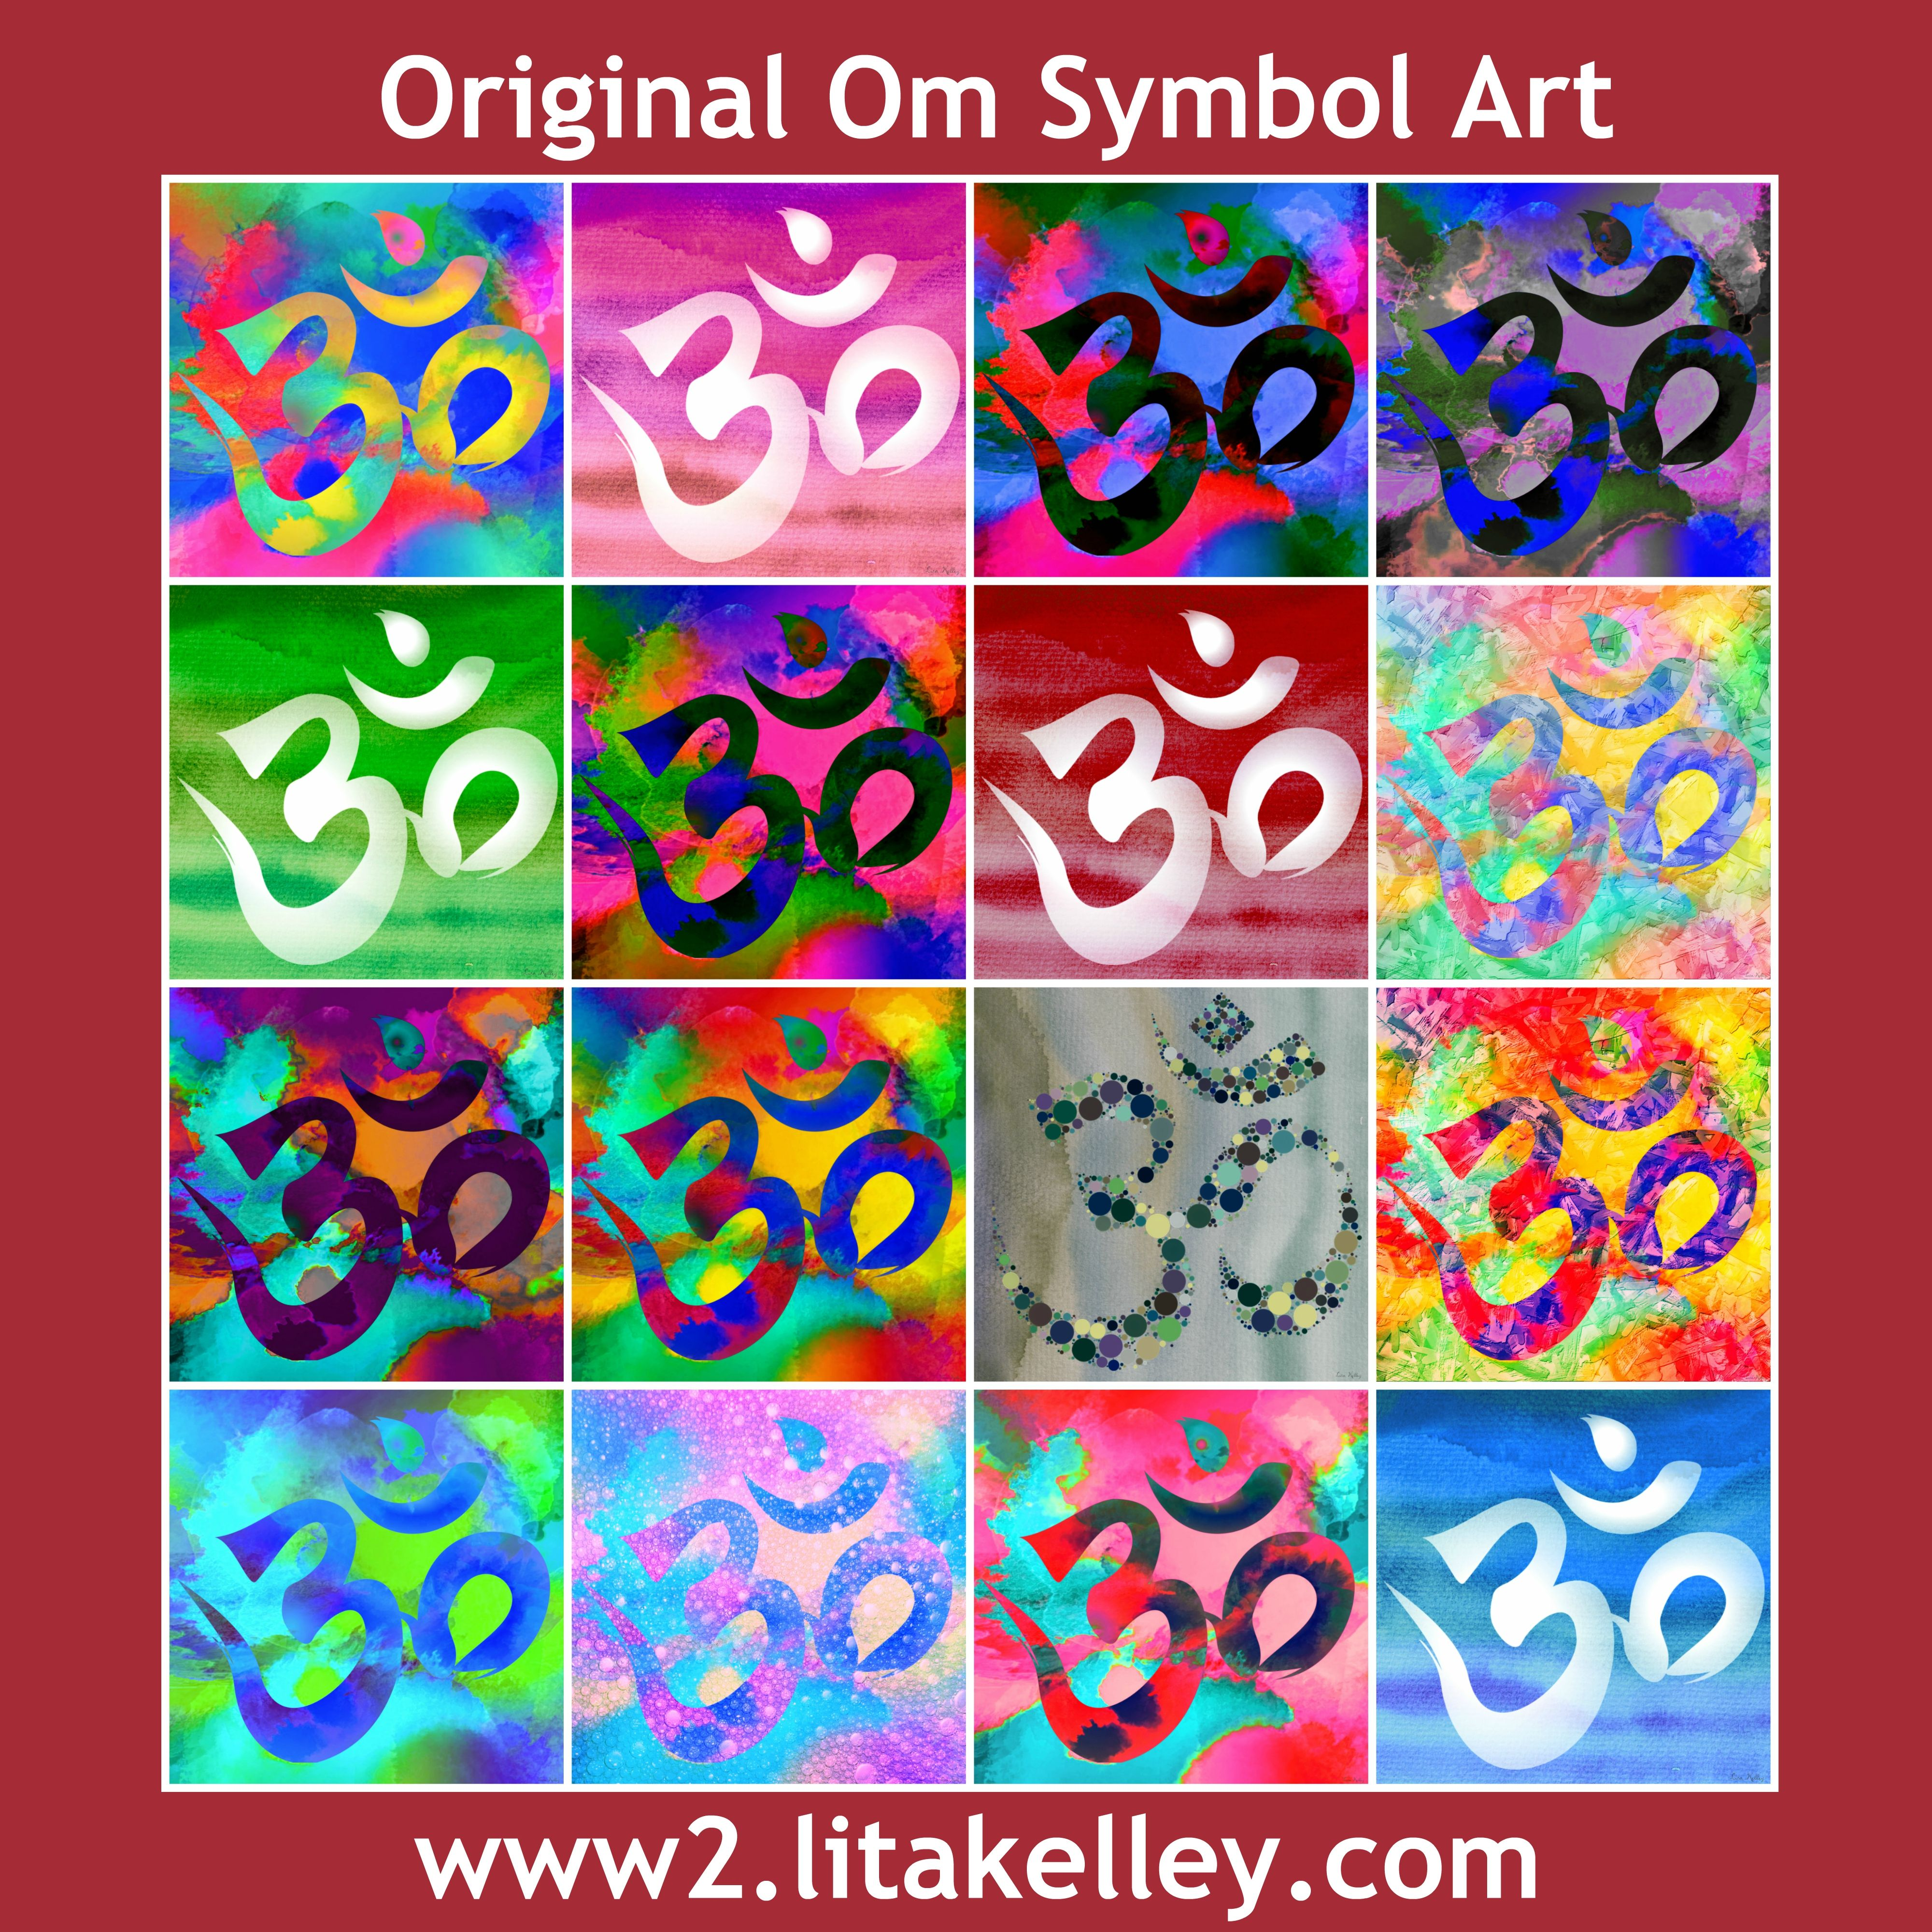 Beautiful om symbol art by lita kelley available in several sizes beautiful om symbol art by lita kelley available in several sizes and colors on your buycottarizona